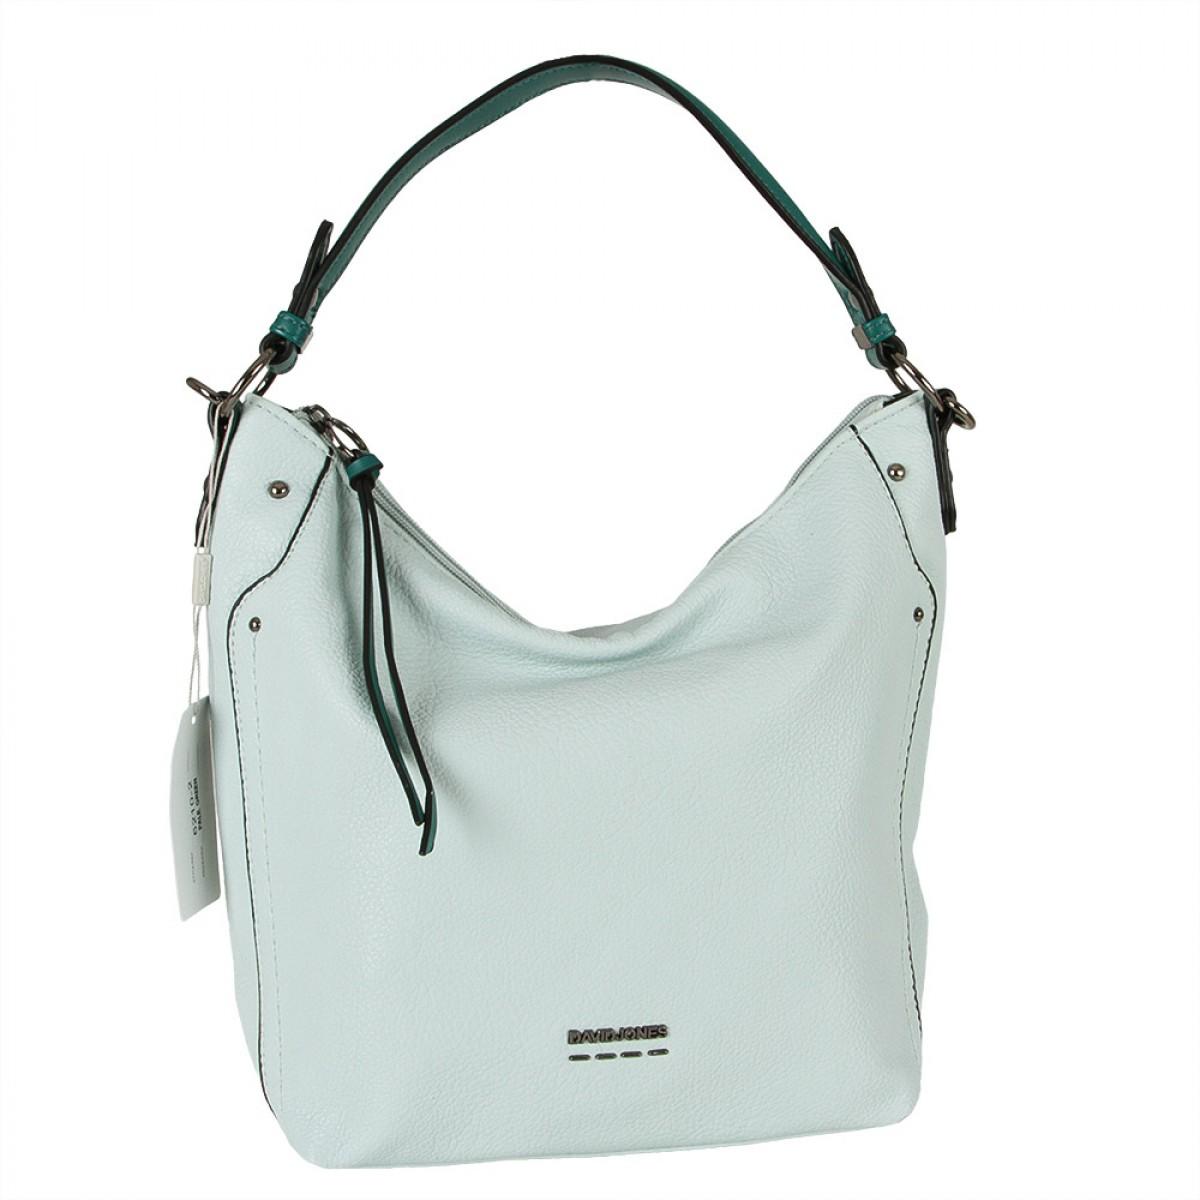 Жіноча сумка David Jones 6210-2 PALE GREEN